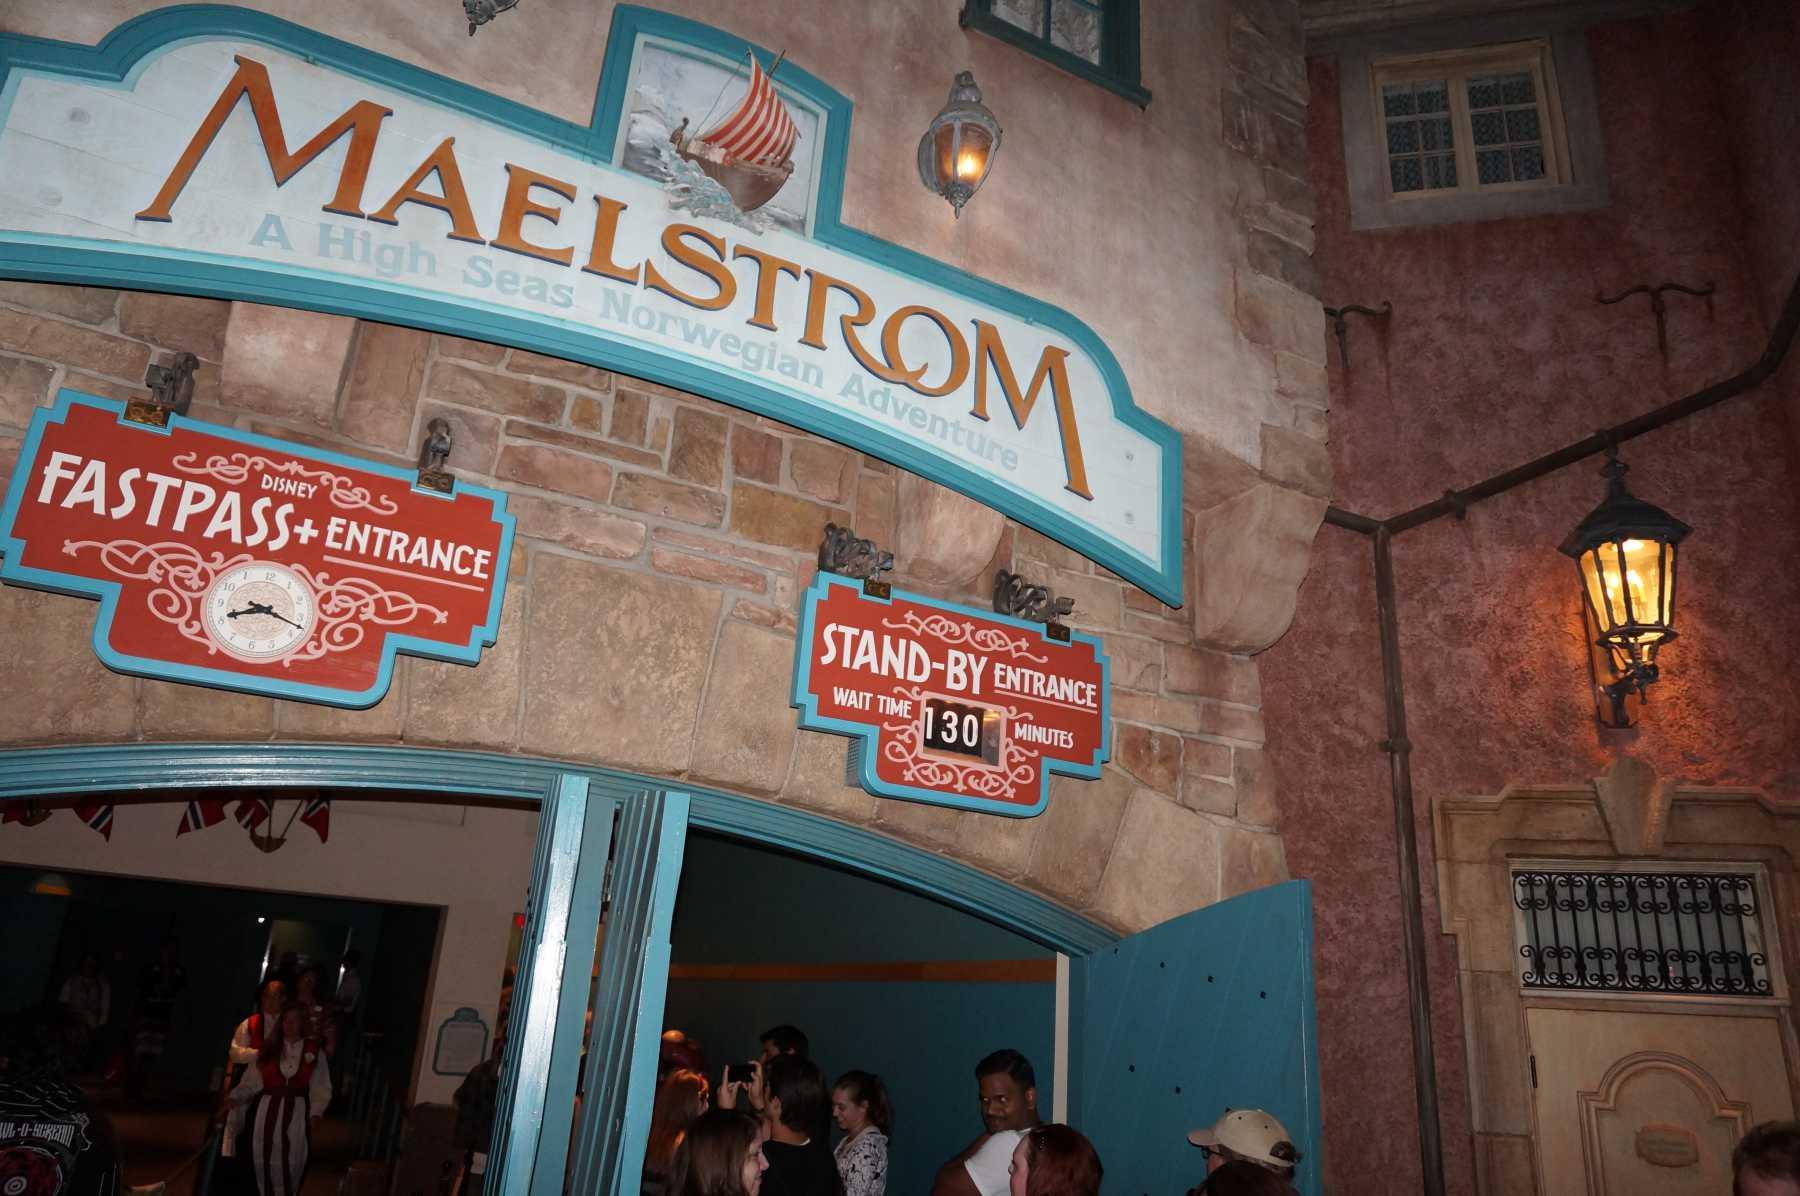 Disney Fans Celebrate The Spirit of Maelstrom   maelstrom